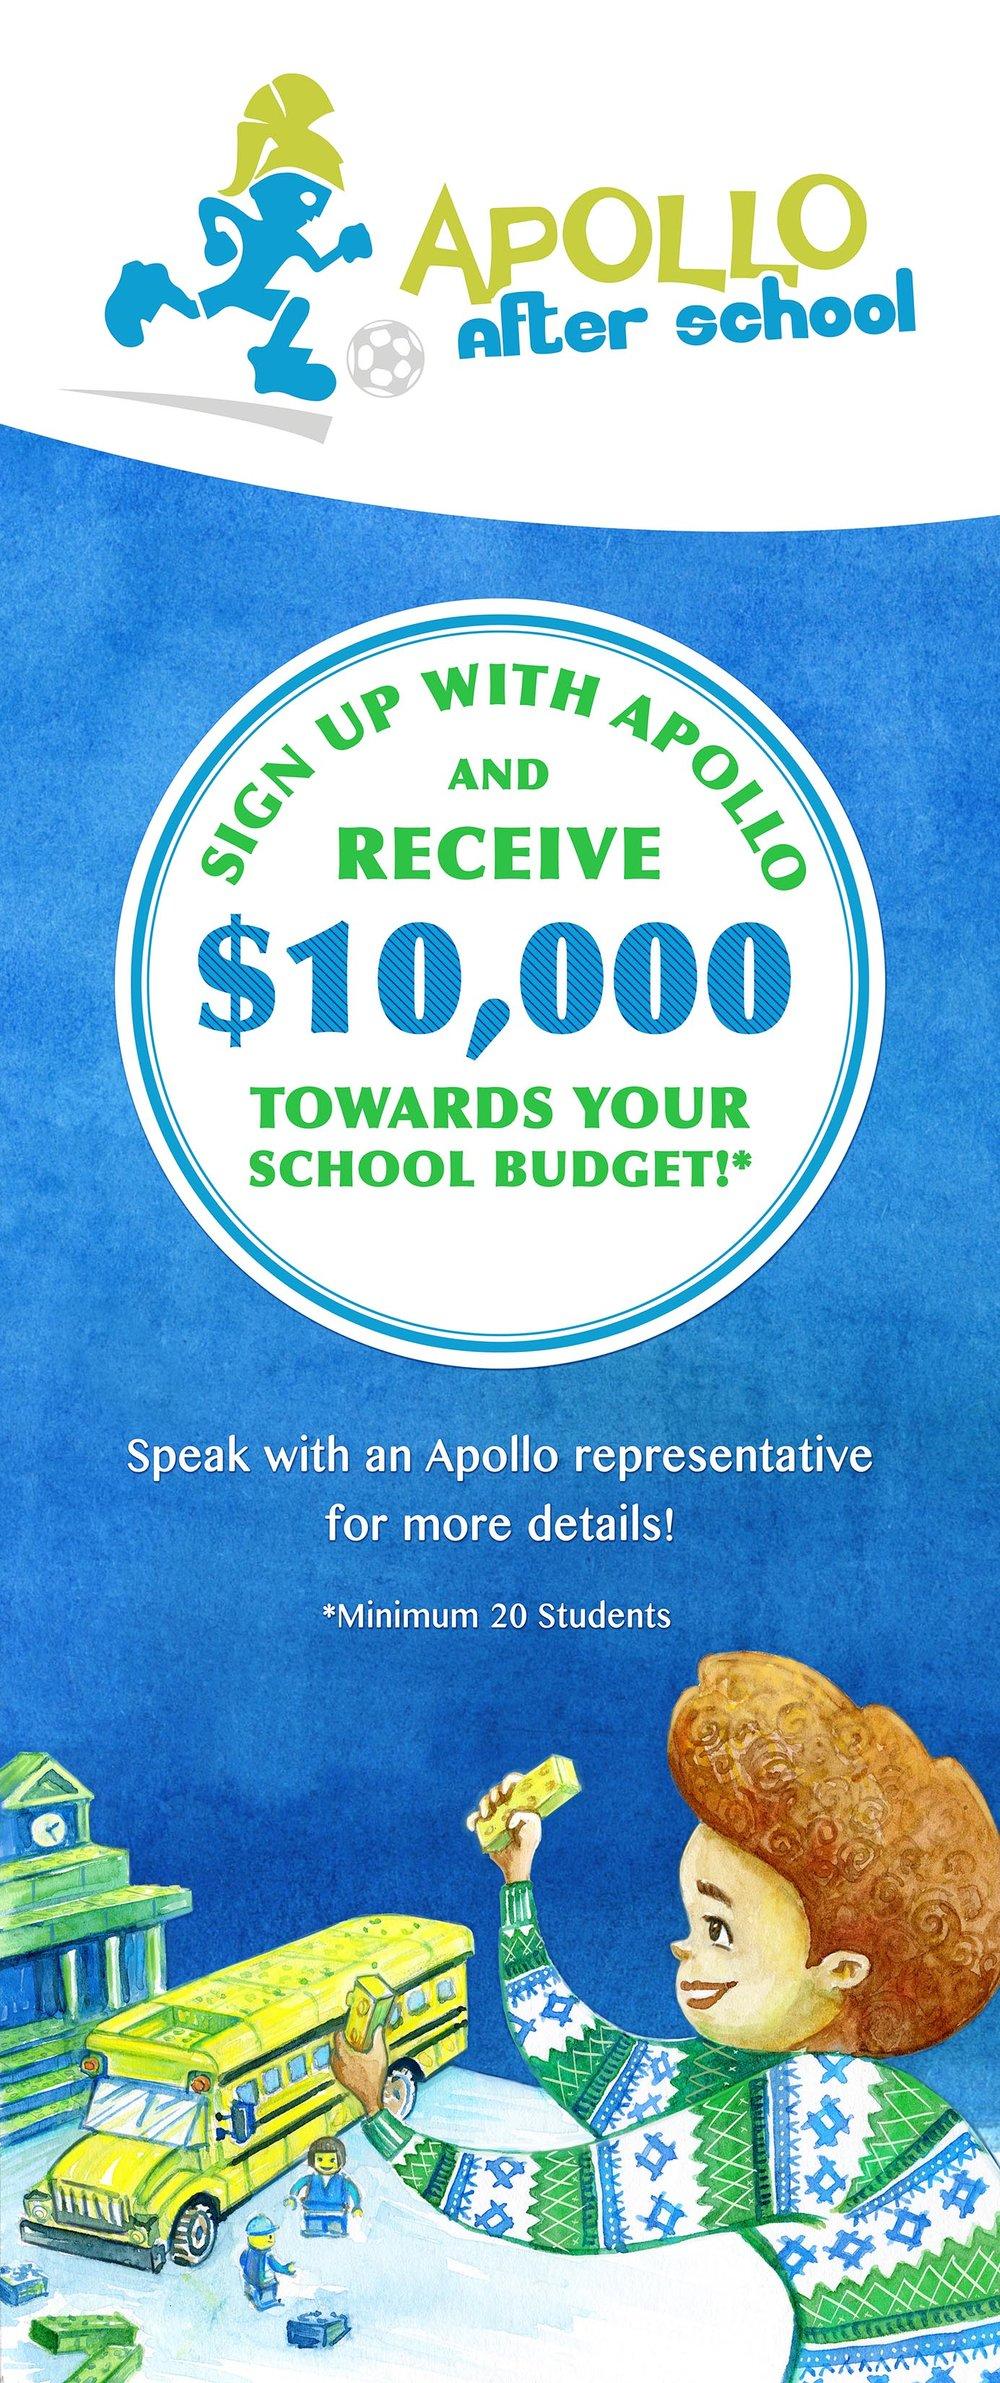 Apollo-side-drop_Budget Promo-Compressed.jpg